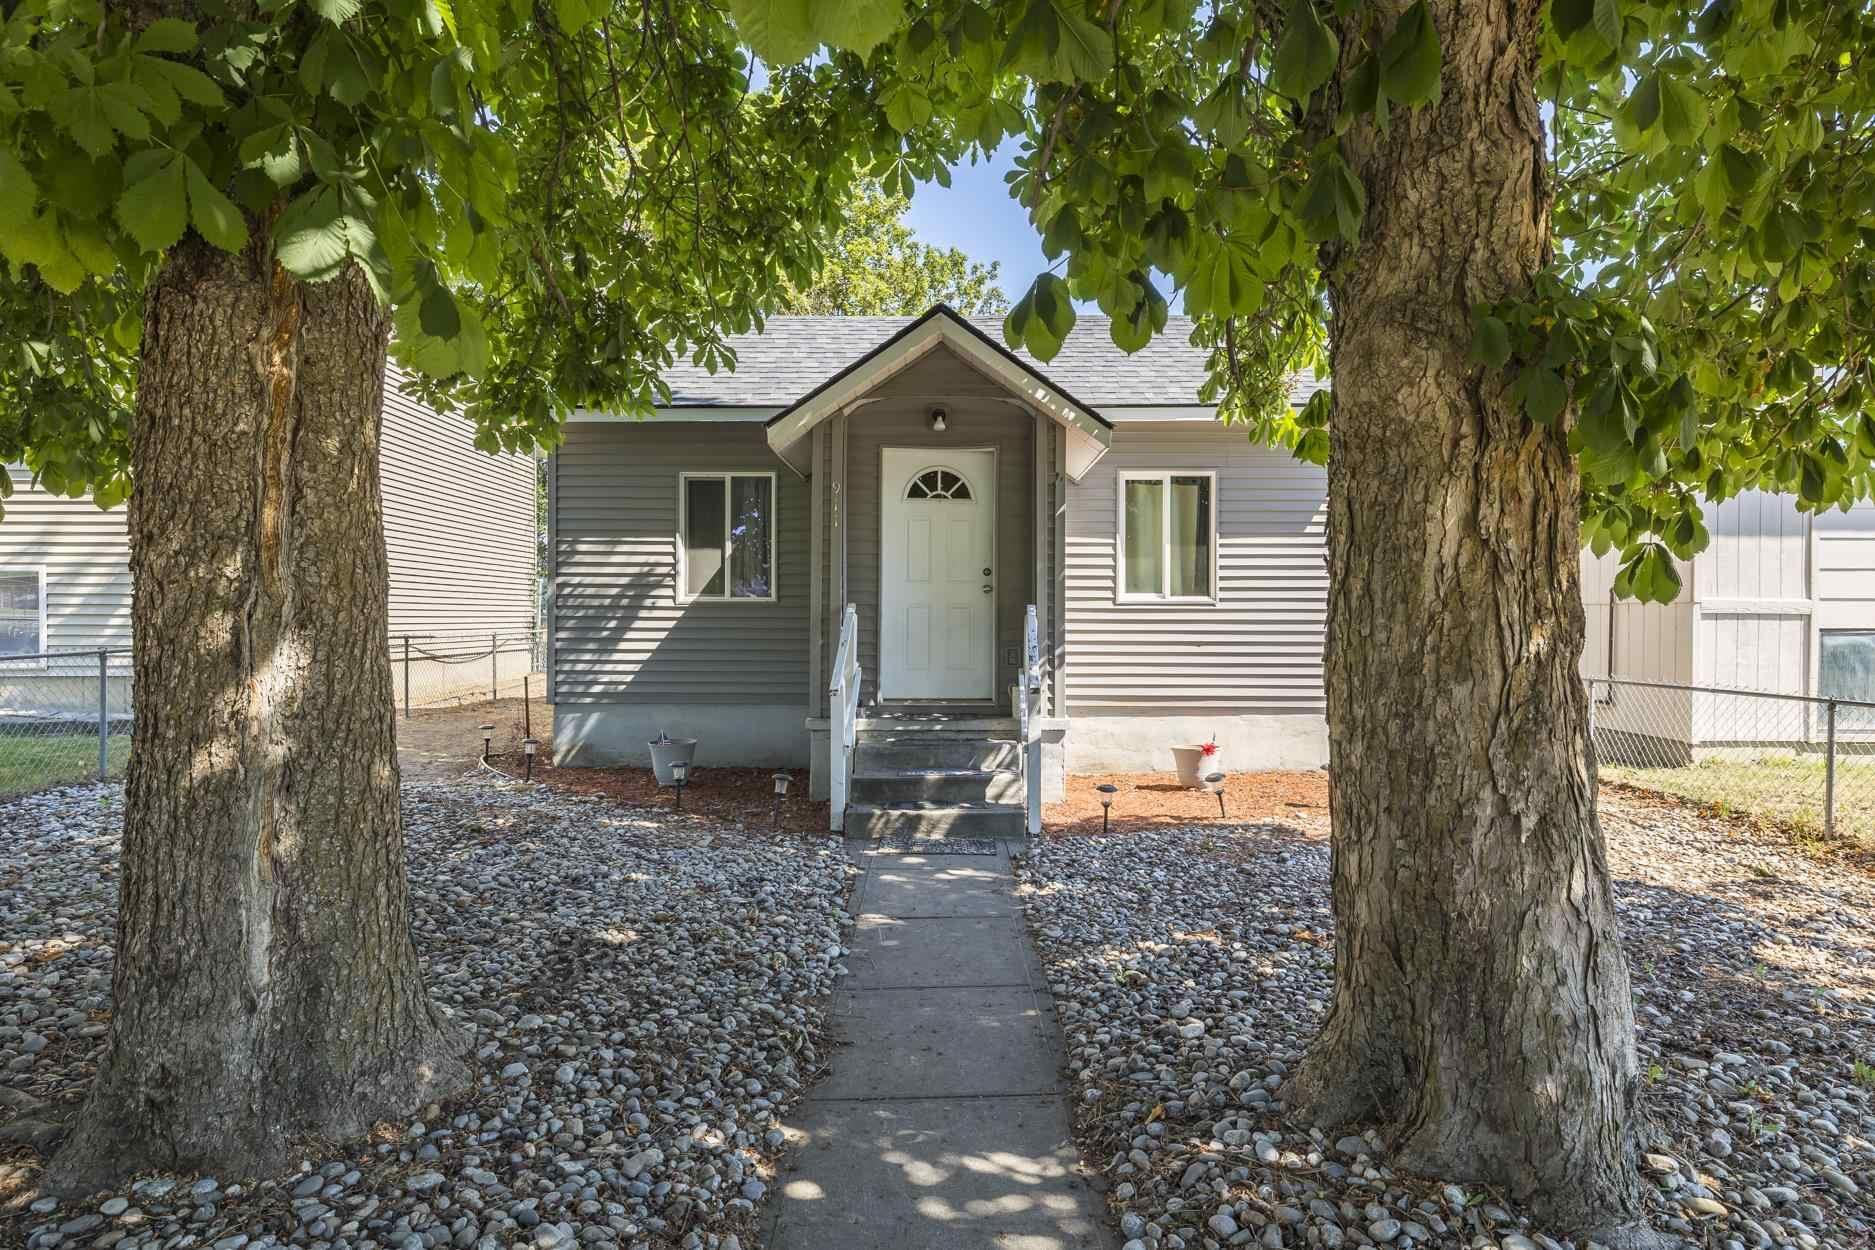 911 E Central Ave, Spokane, WA 99208 - #: 202118203